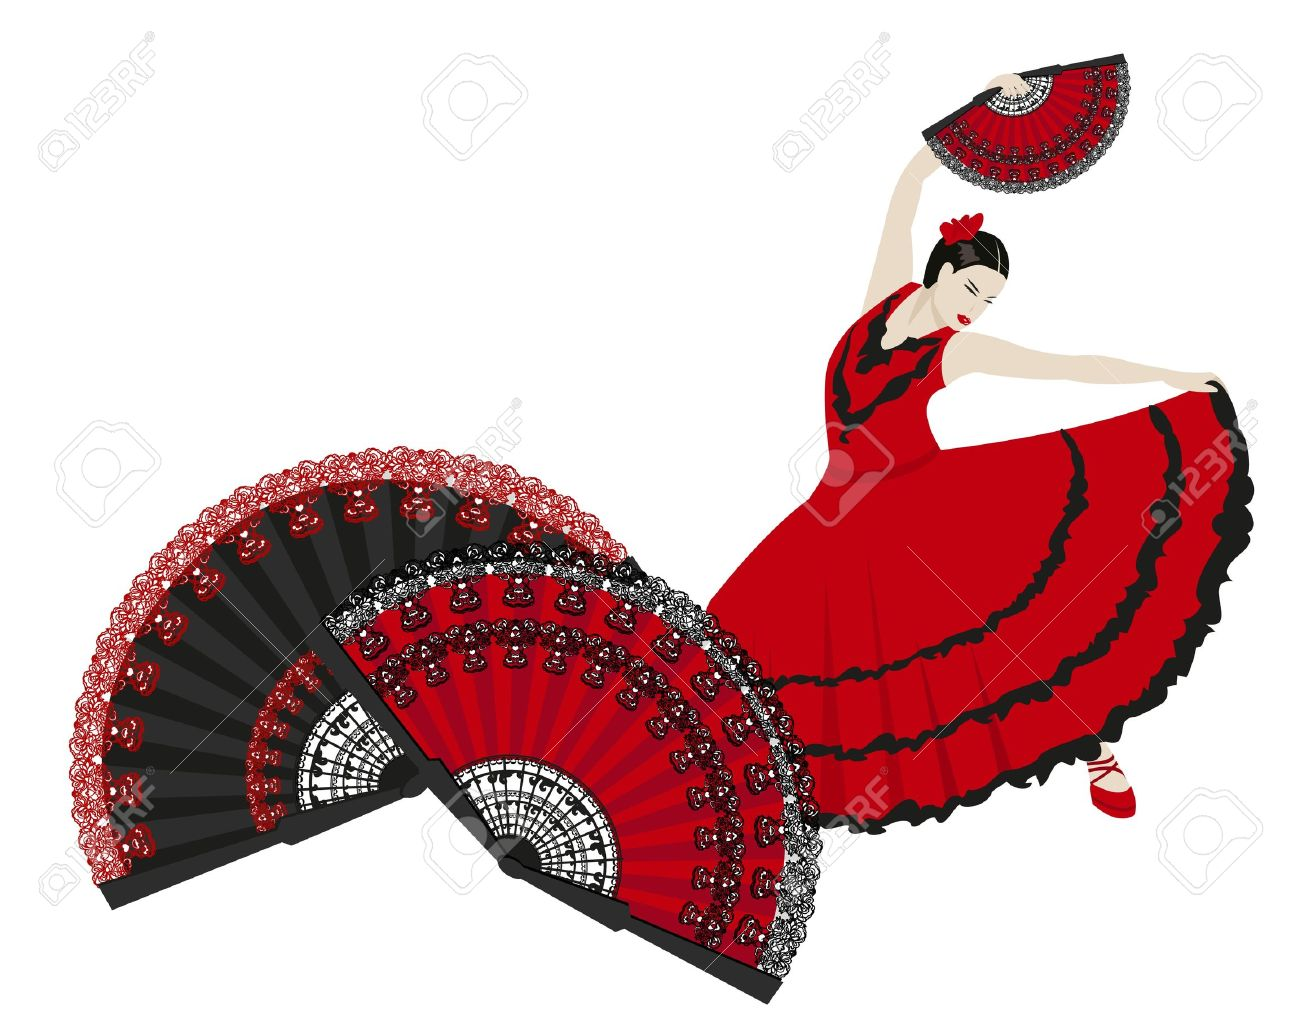 Spain flamenco dancers clipart 7 » Clipart Station.